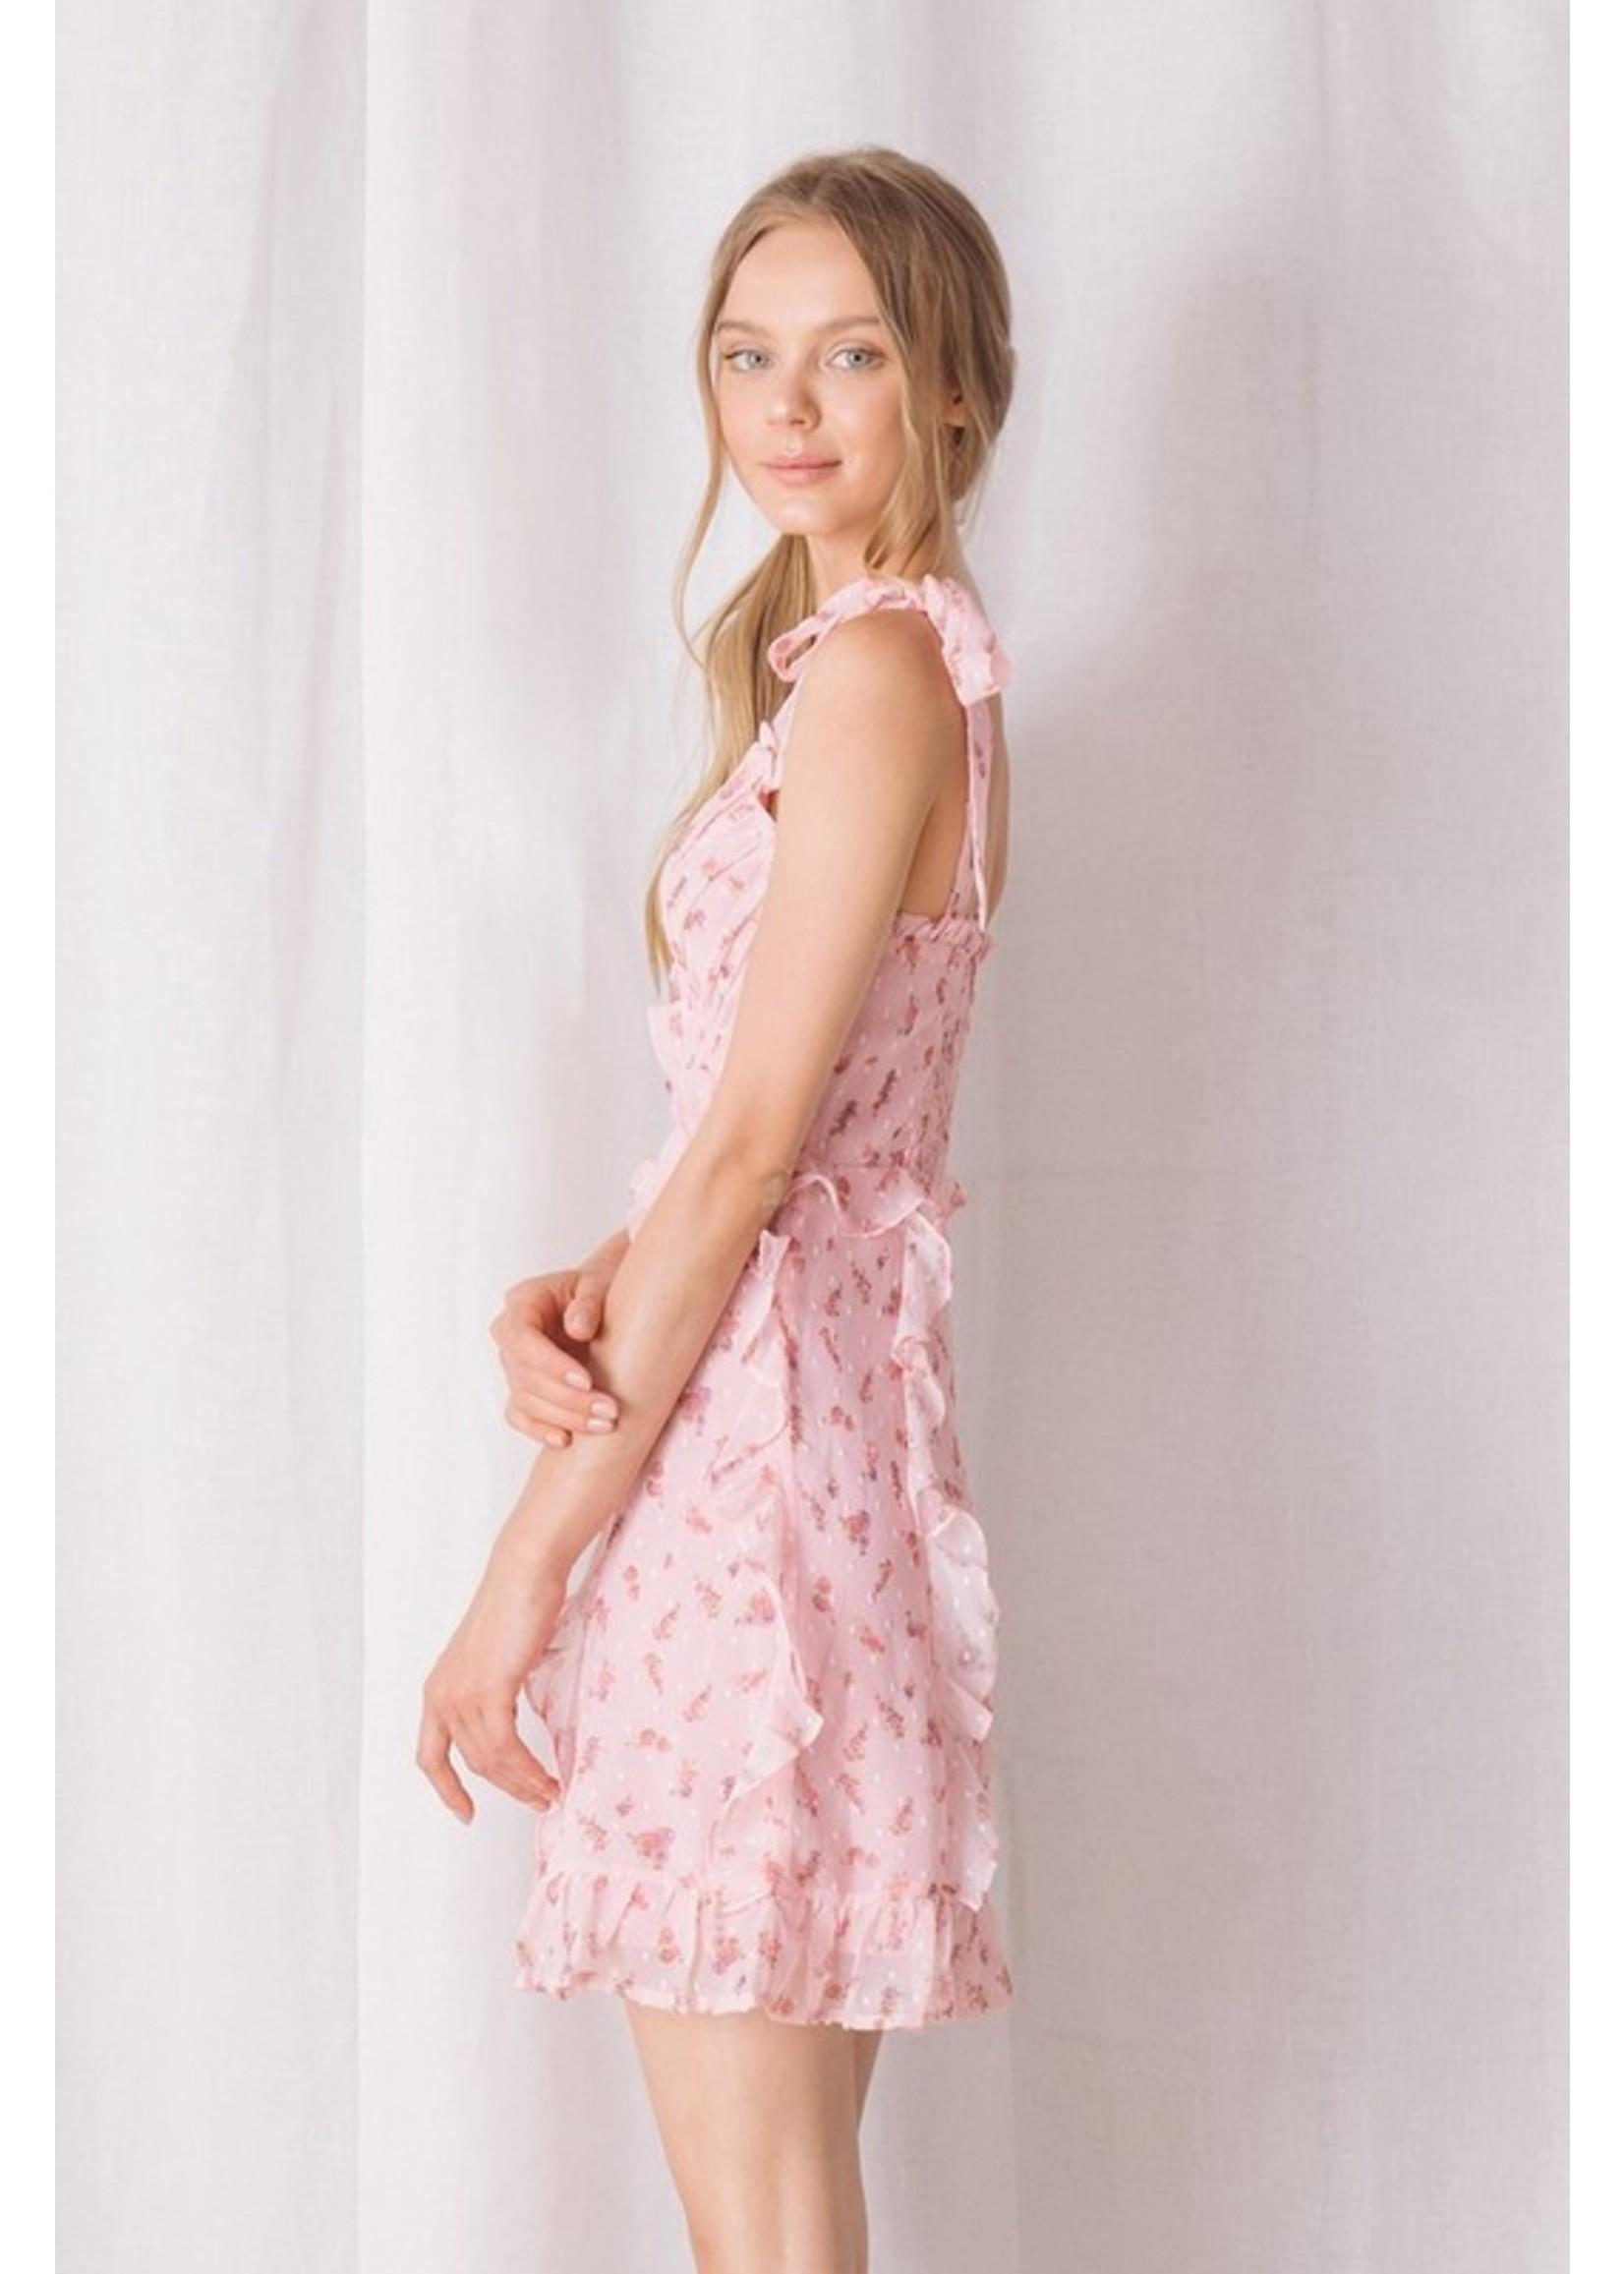 Storia Floral and Swiss Dot Ruffled Mini Dress - BD1170A